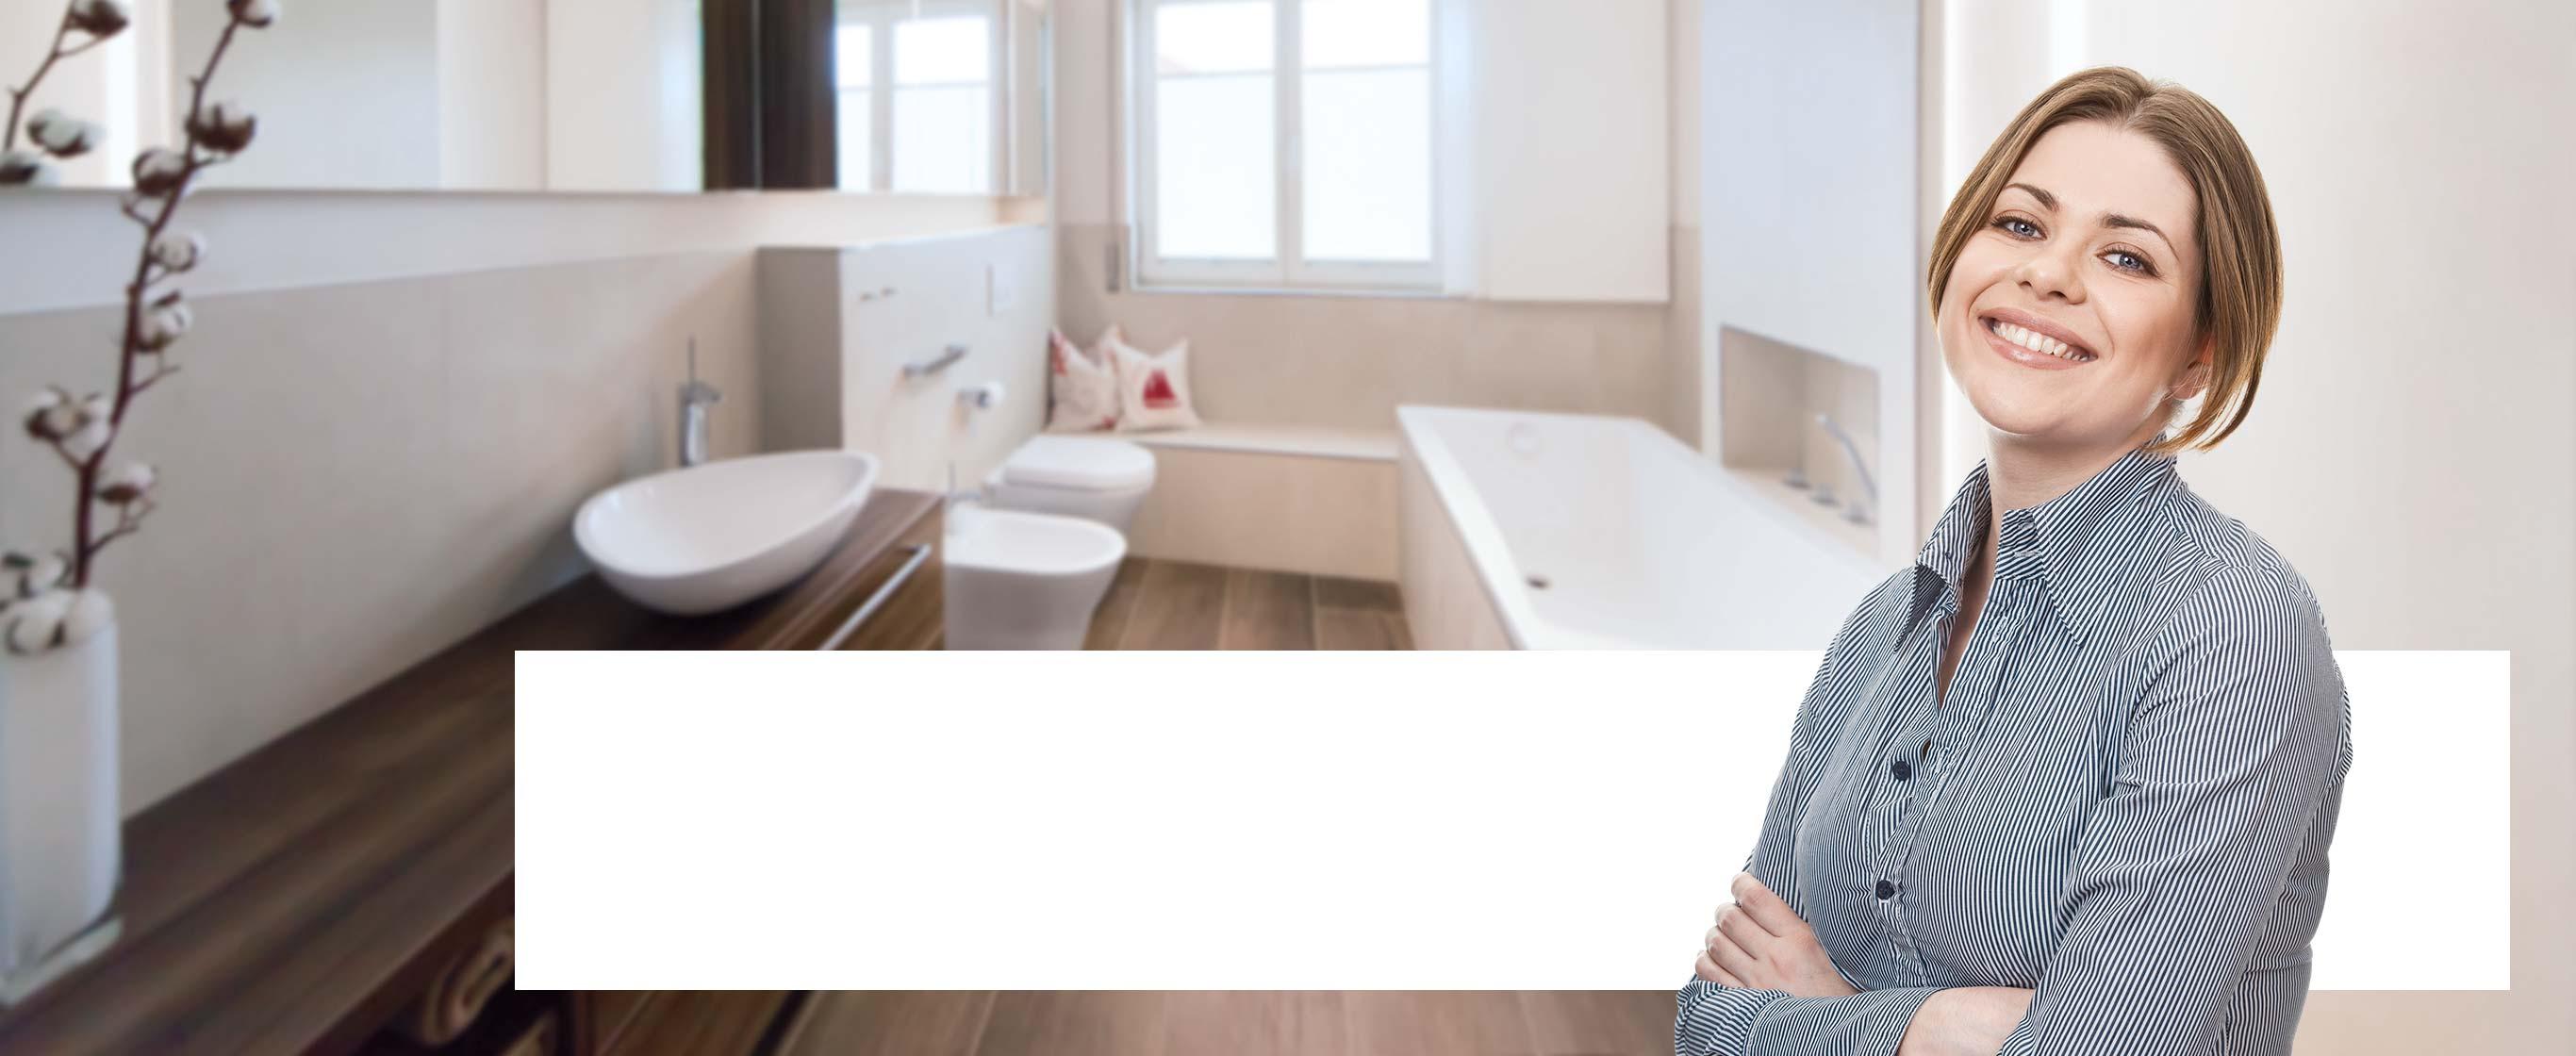 DIE BADGESTALTER-Kampagne: Mein Bad, mein Geschmack.